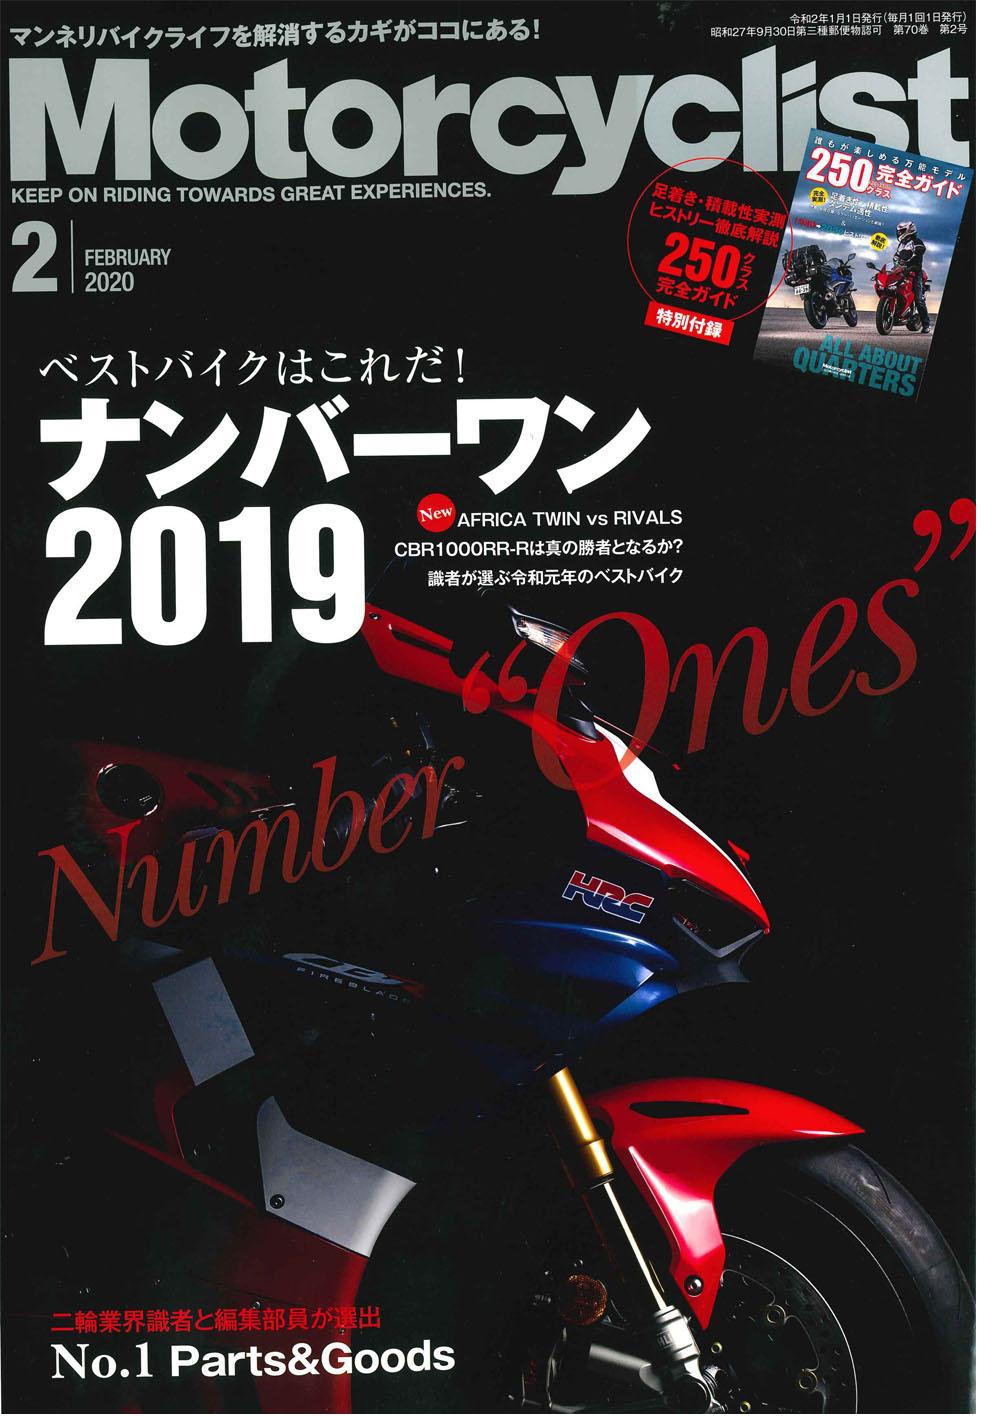 【Motorcyclist 2月号掲載】 2019バイク用品アワード選出